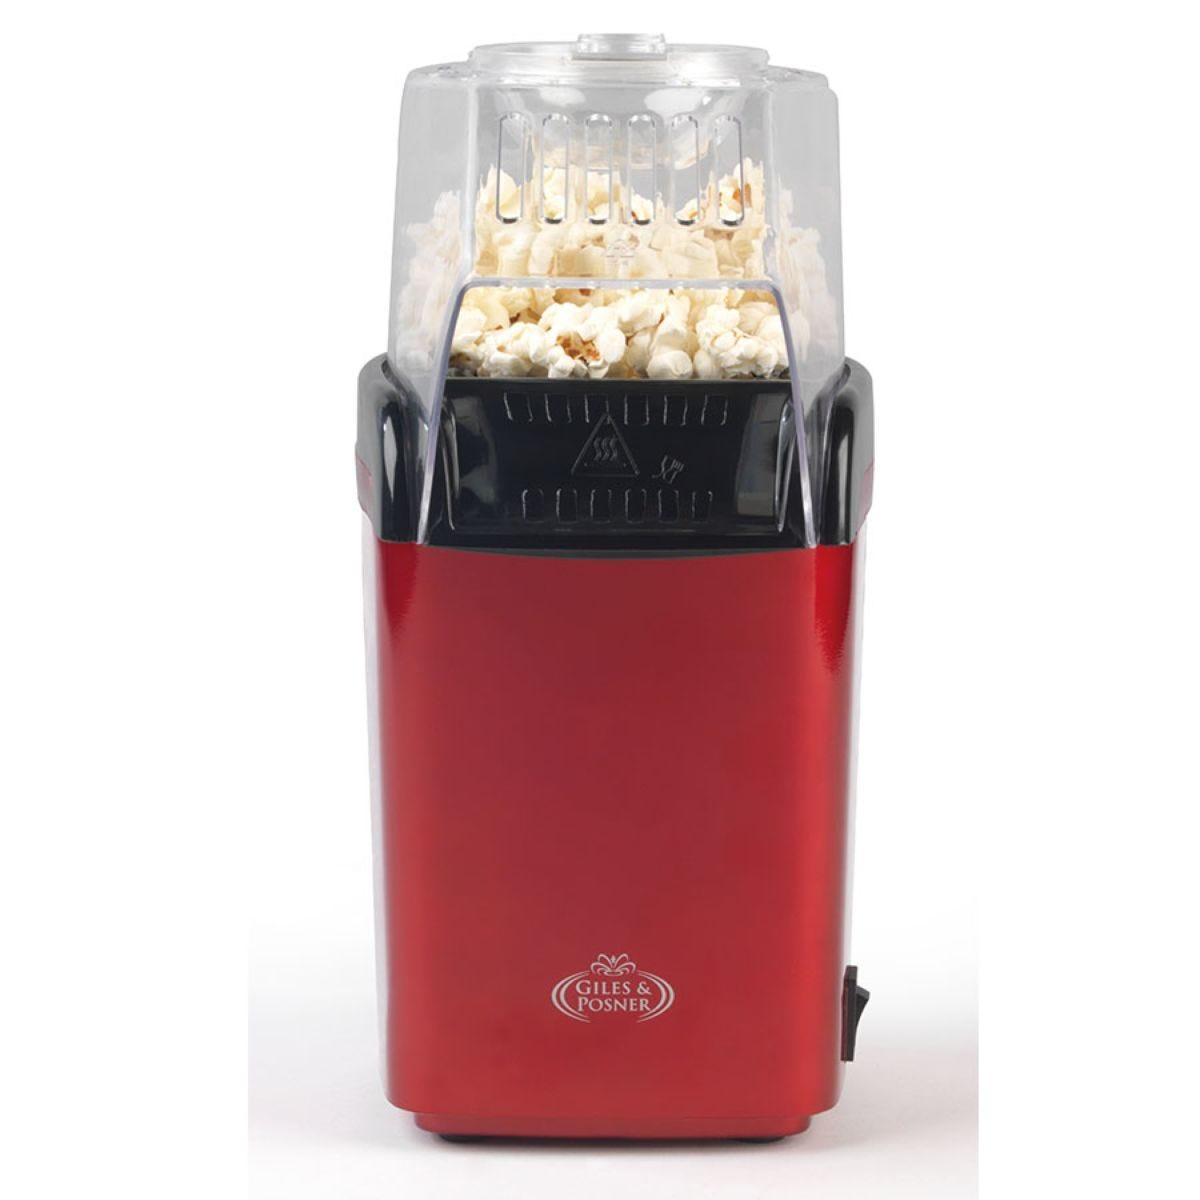 Giles & Posner Popcorn Maker